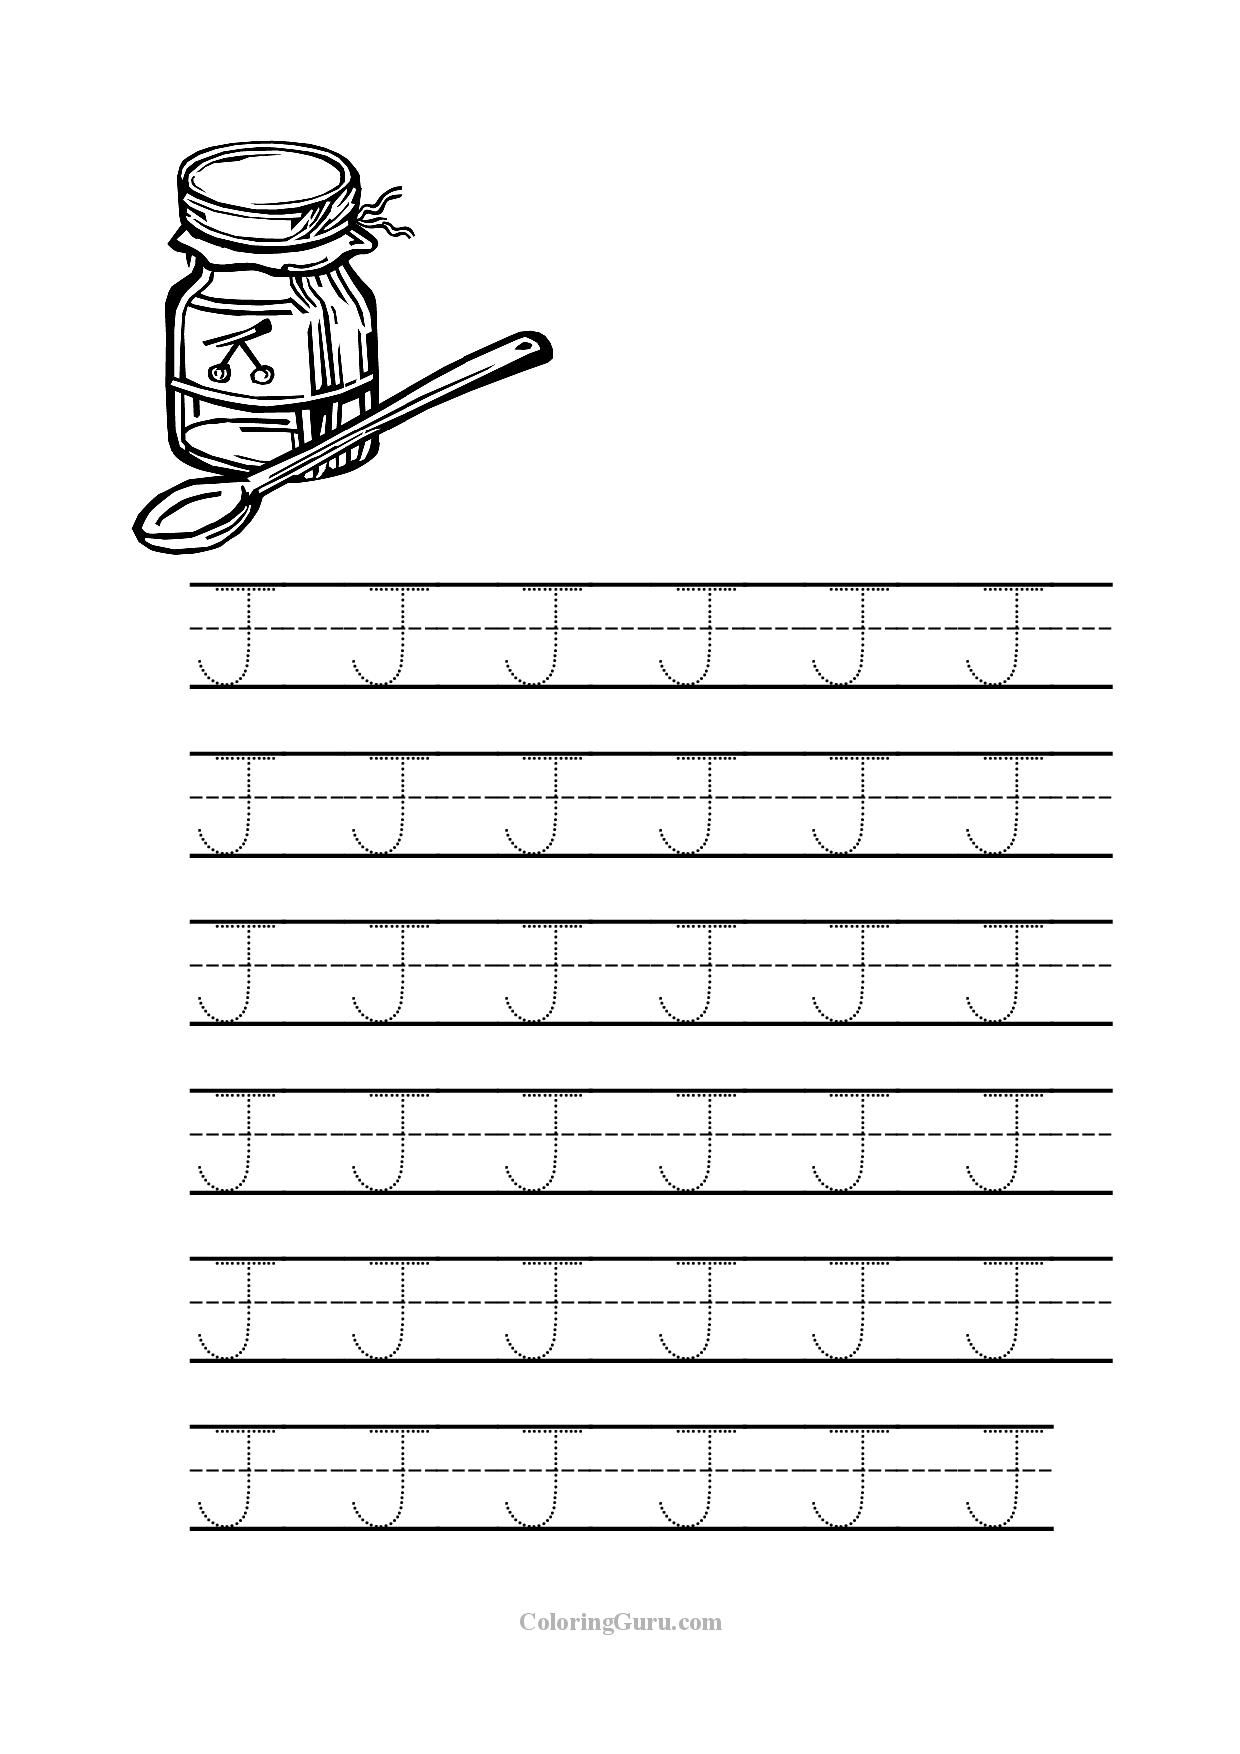 Free Printable Alphabet Tracing Free Tracing Letter J pertaining to Alphabet Tracing Letter J